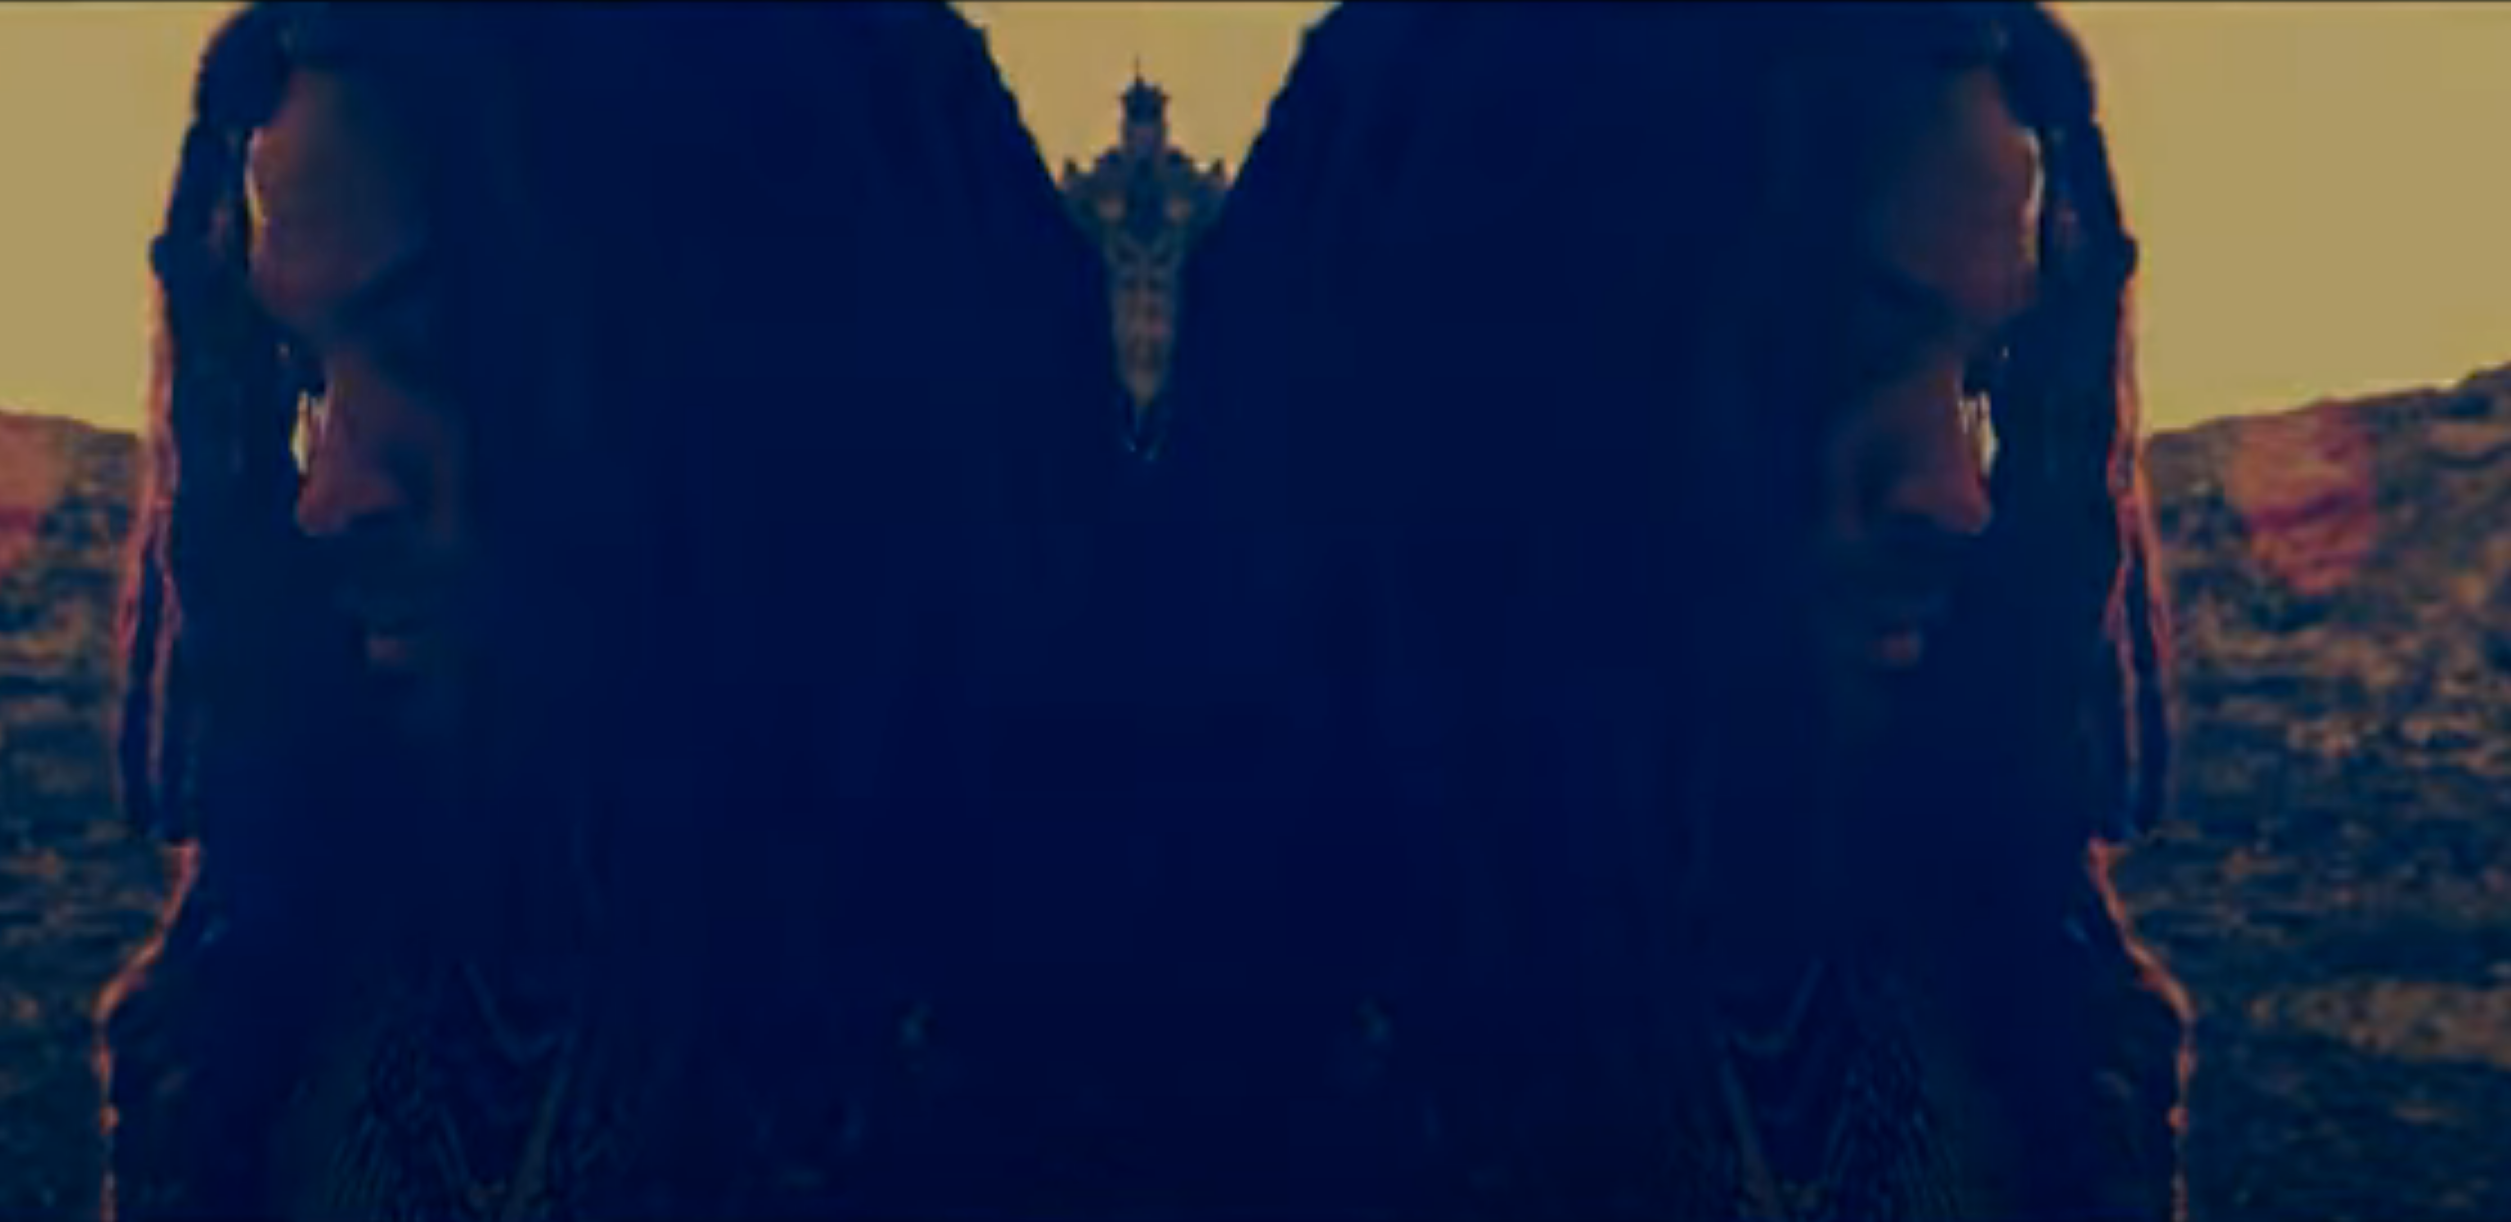 Lenny Kravitz Returns With 'Raise Vibration' Video